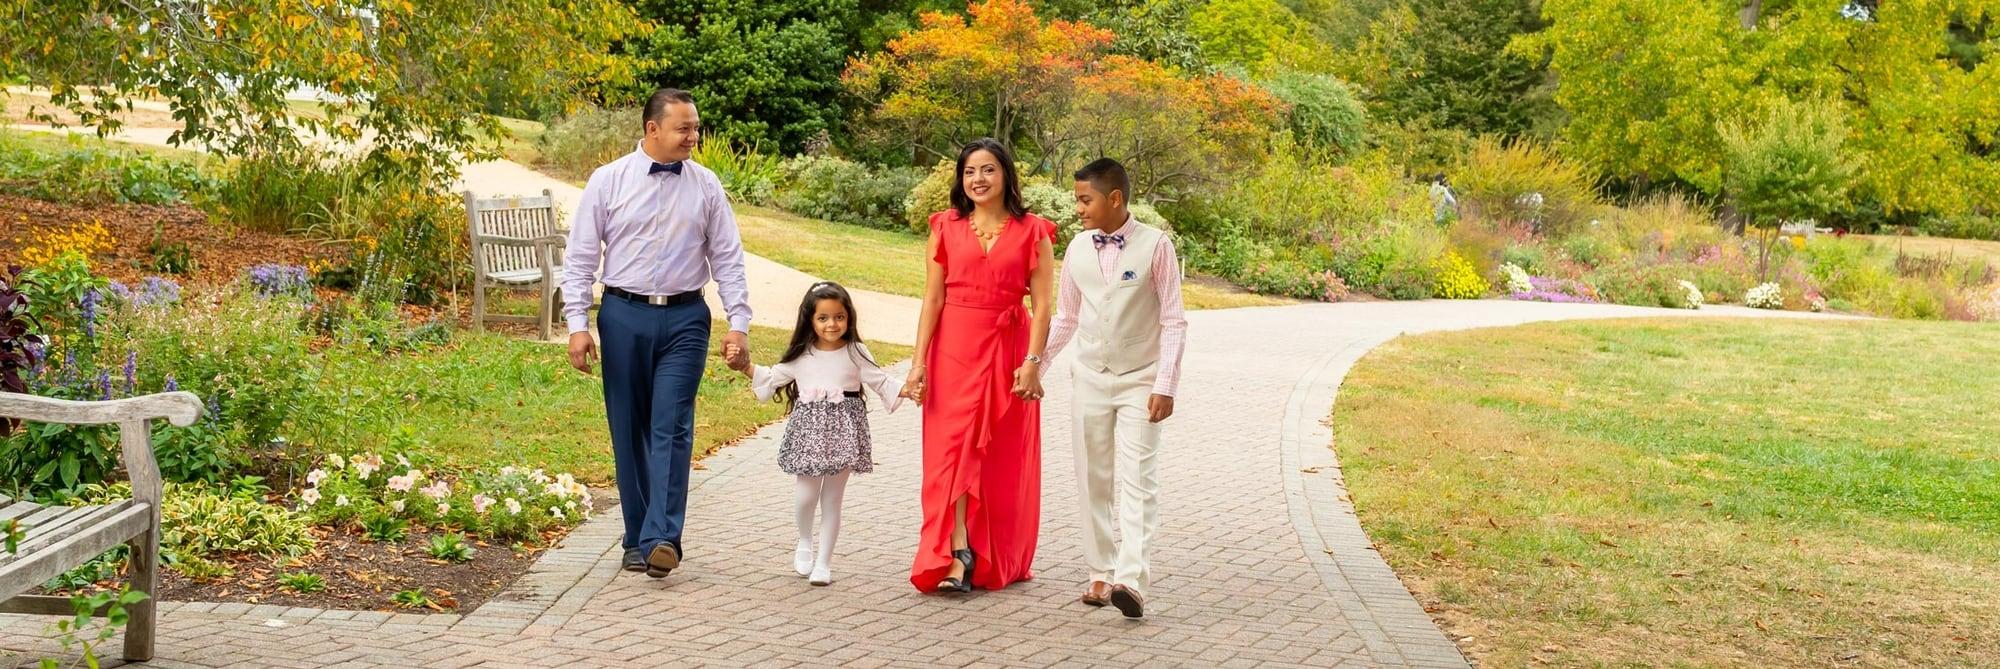 Lifestyle photography - family photography at the Green Spring Gardens, Alexandria VA